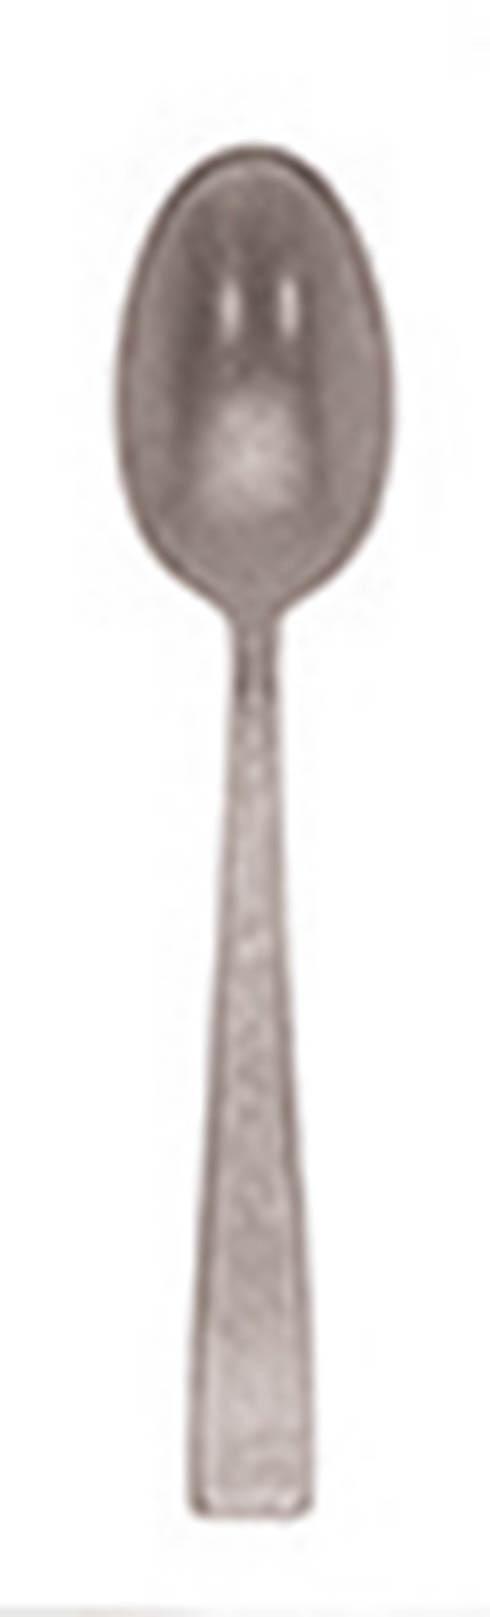 $8.00 Moka Spoon